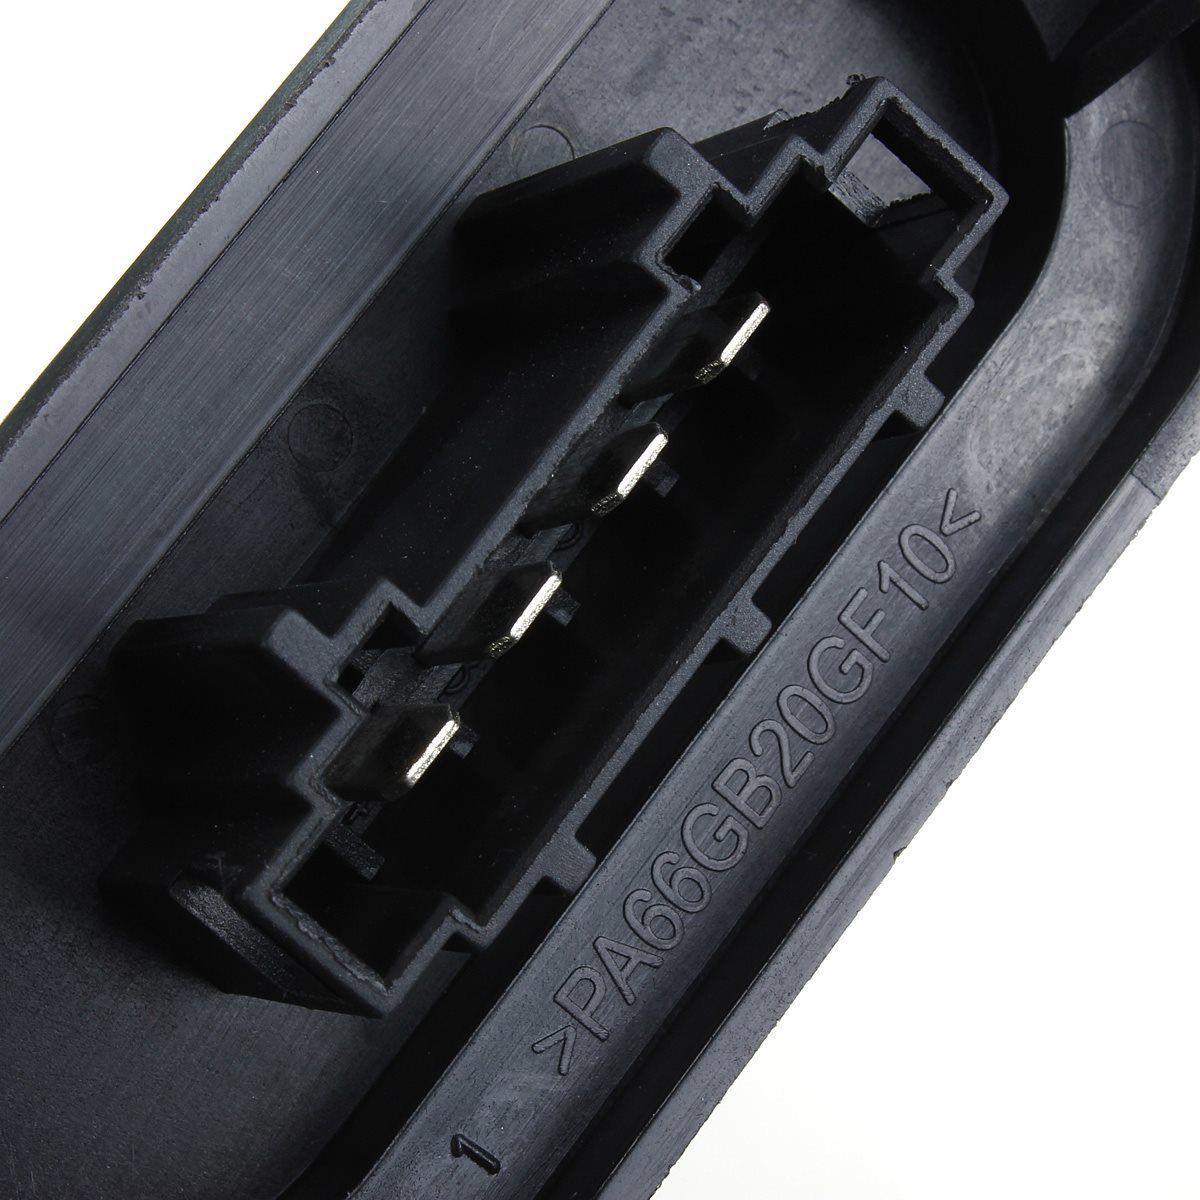 Resistencia Ar Condicionado Amarok 2.0 16v Diesel de 2010 à 2018 - 7e0959263c